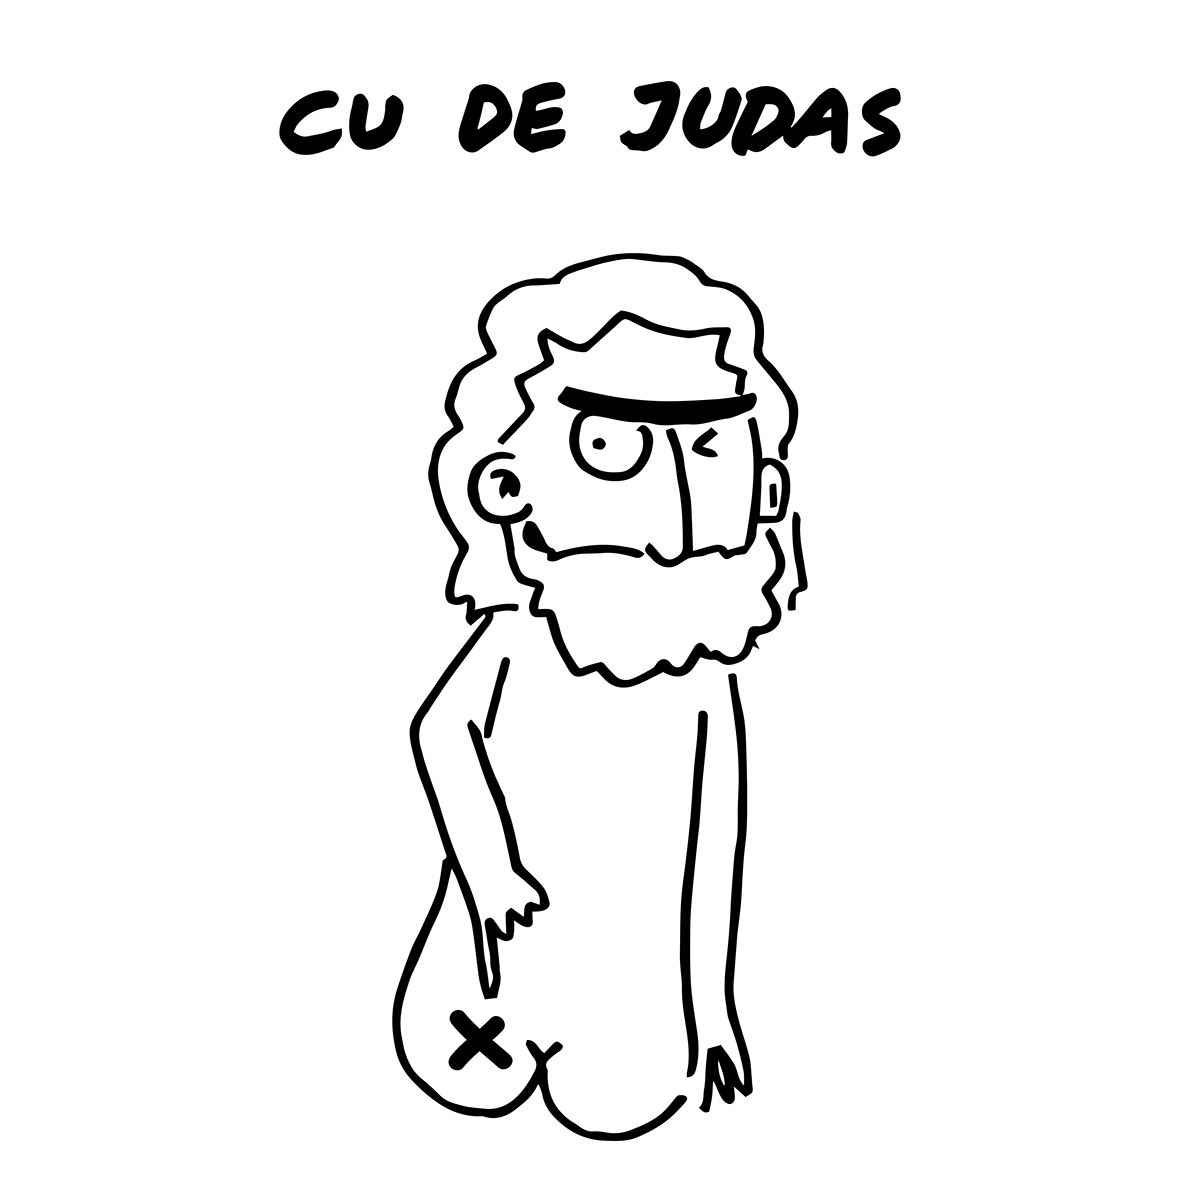 Portuguese expressions Portugal idiomatic expressions ILLUSTRATION  Cartoons